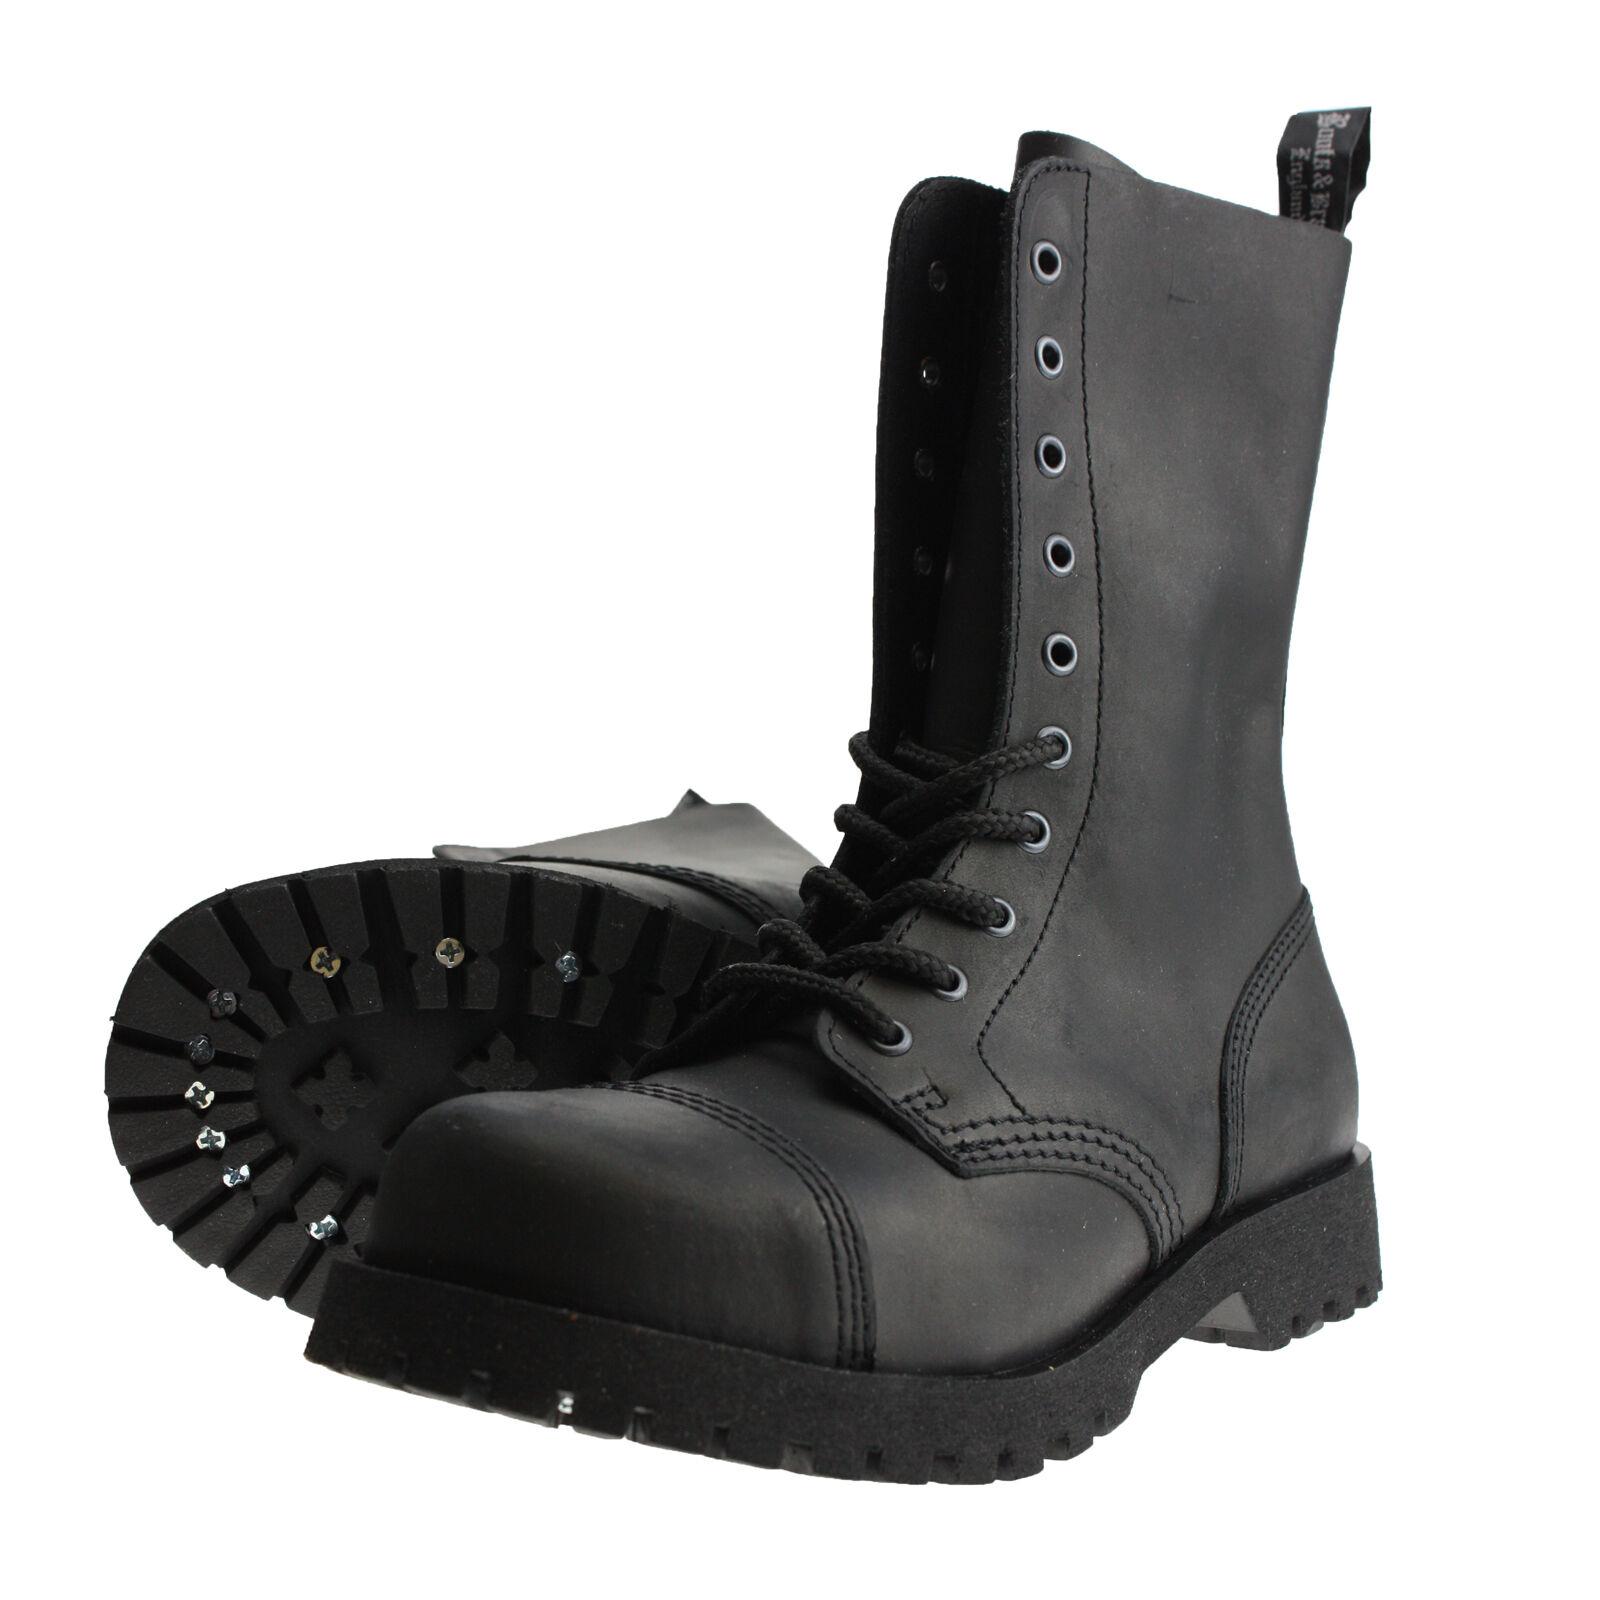 Boots and Braces 10-Loch Crazy Horse Nubukleder Matt black Stiefel Stahlkappe